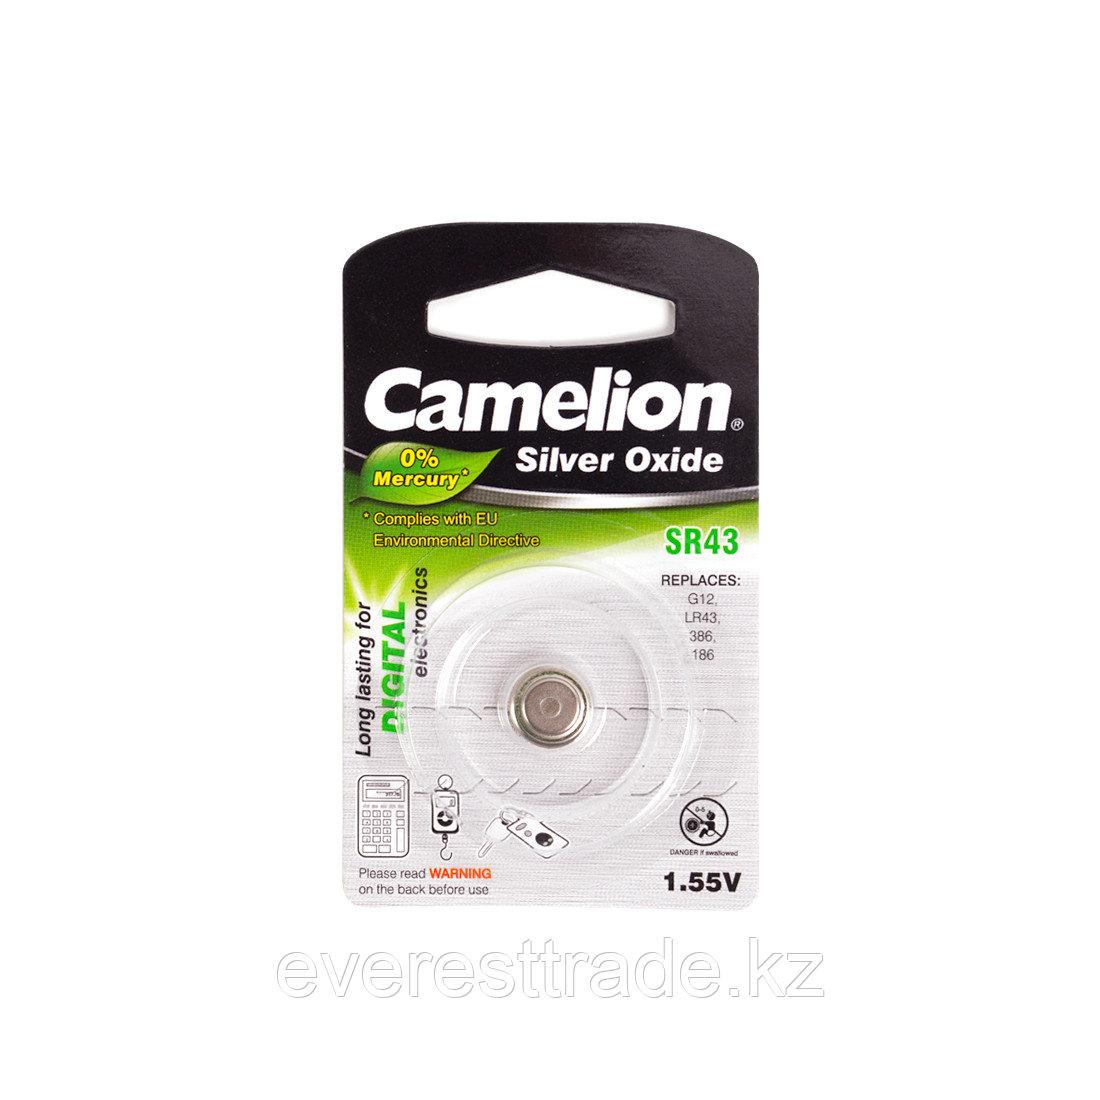 Camelion Батарейки,CAMELION, SR43-BP1 , Silver Oxide, 1.55V, 0% Ртути, 1 шт., Блистер